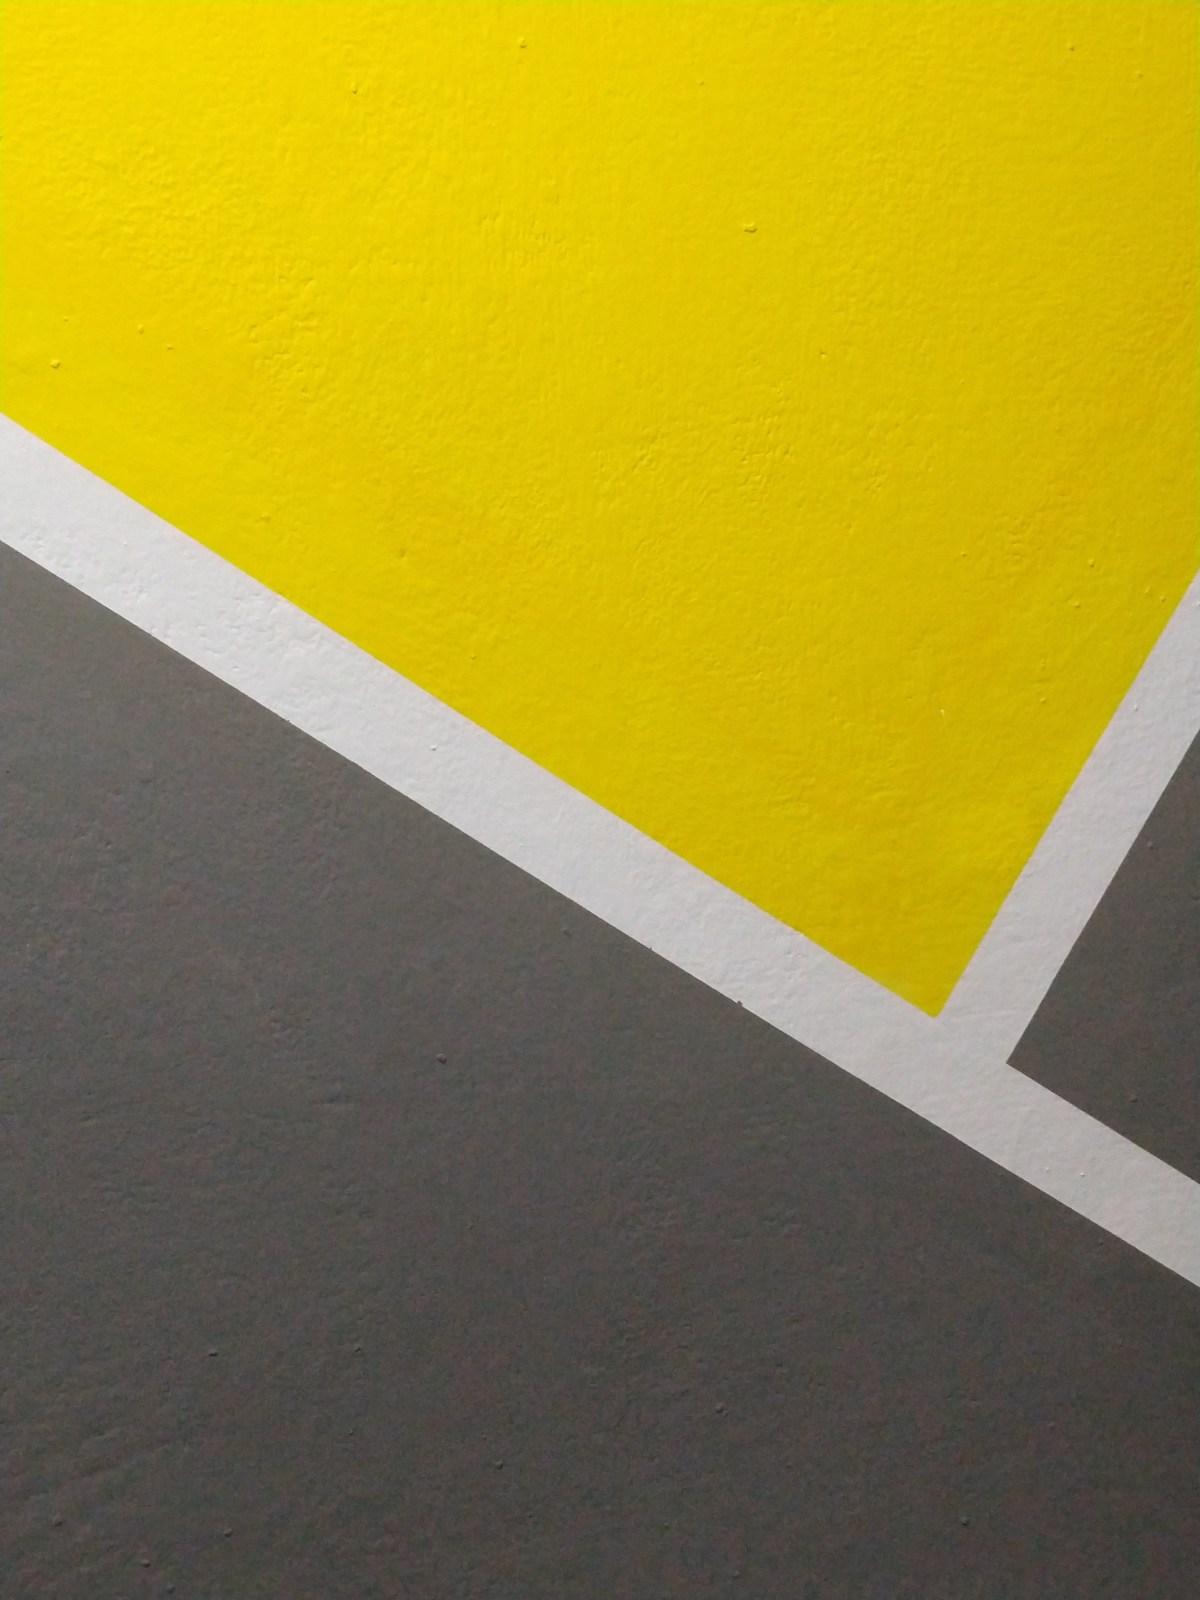 Yellow, White and Gray Background